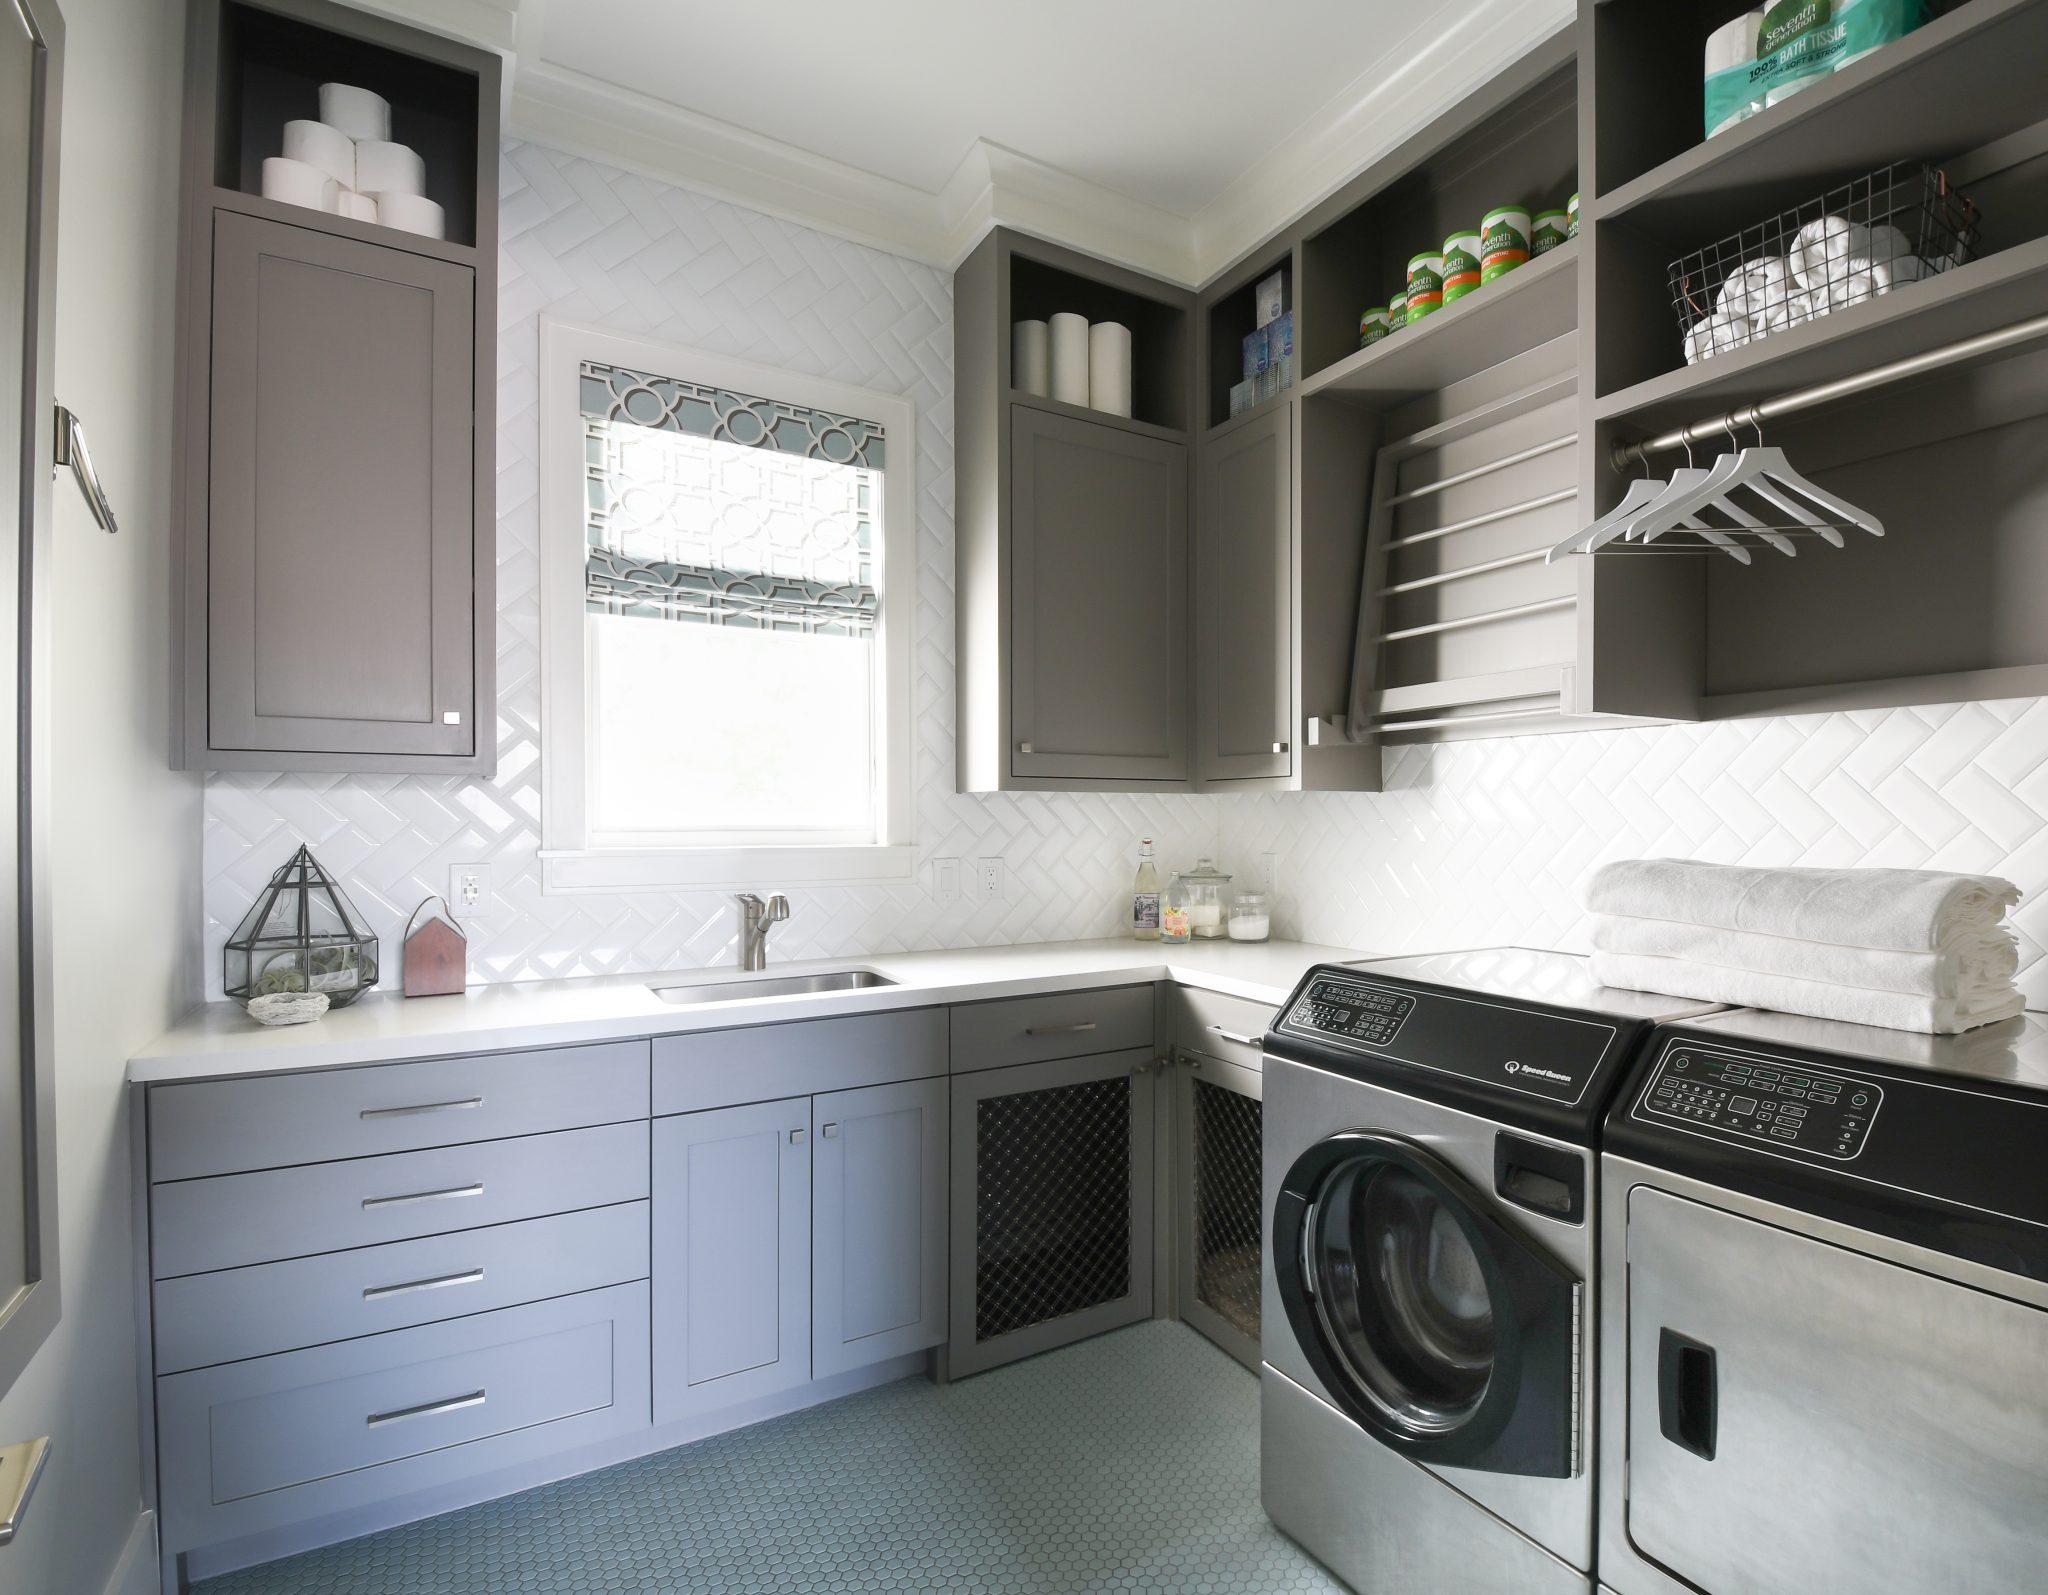 laundry room remodel LBJ Construction Houston's Luxury remodeler and Handyman